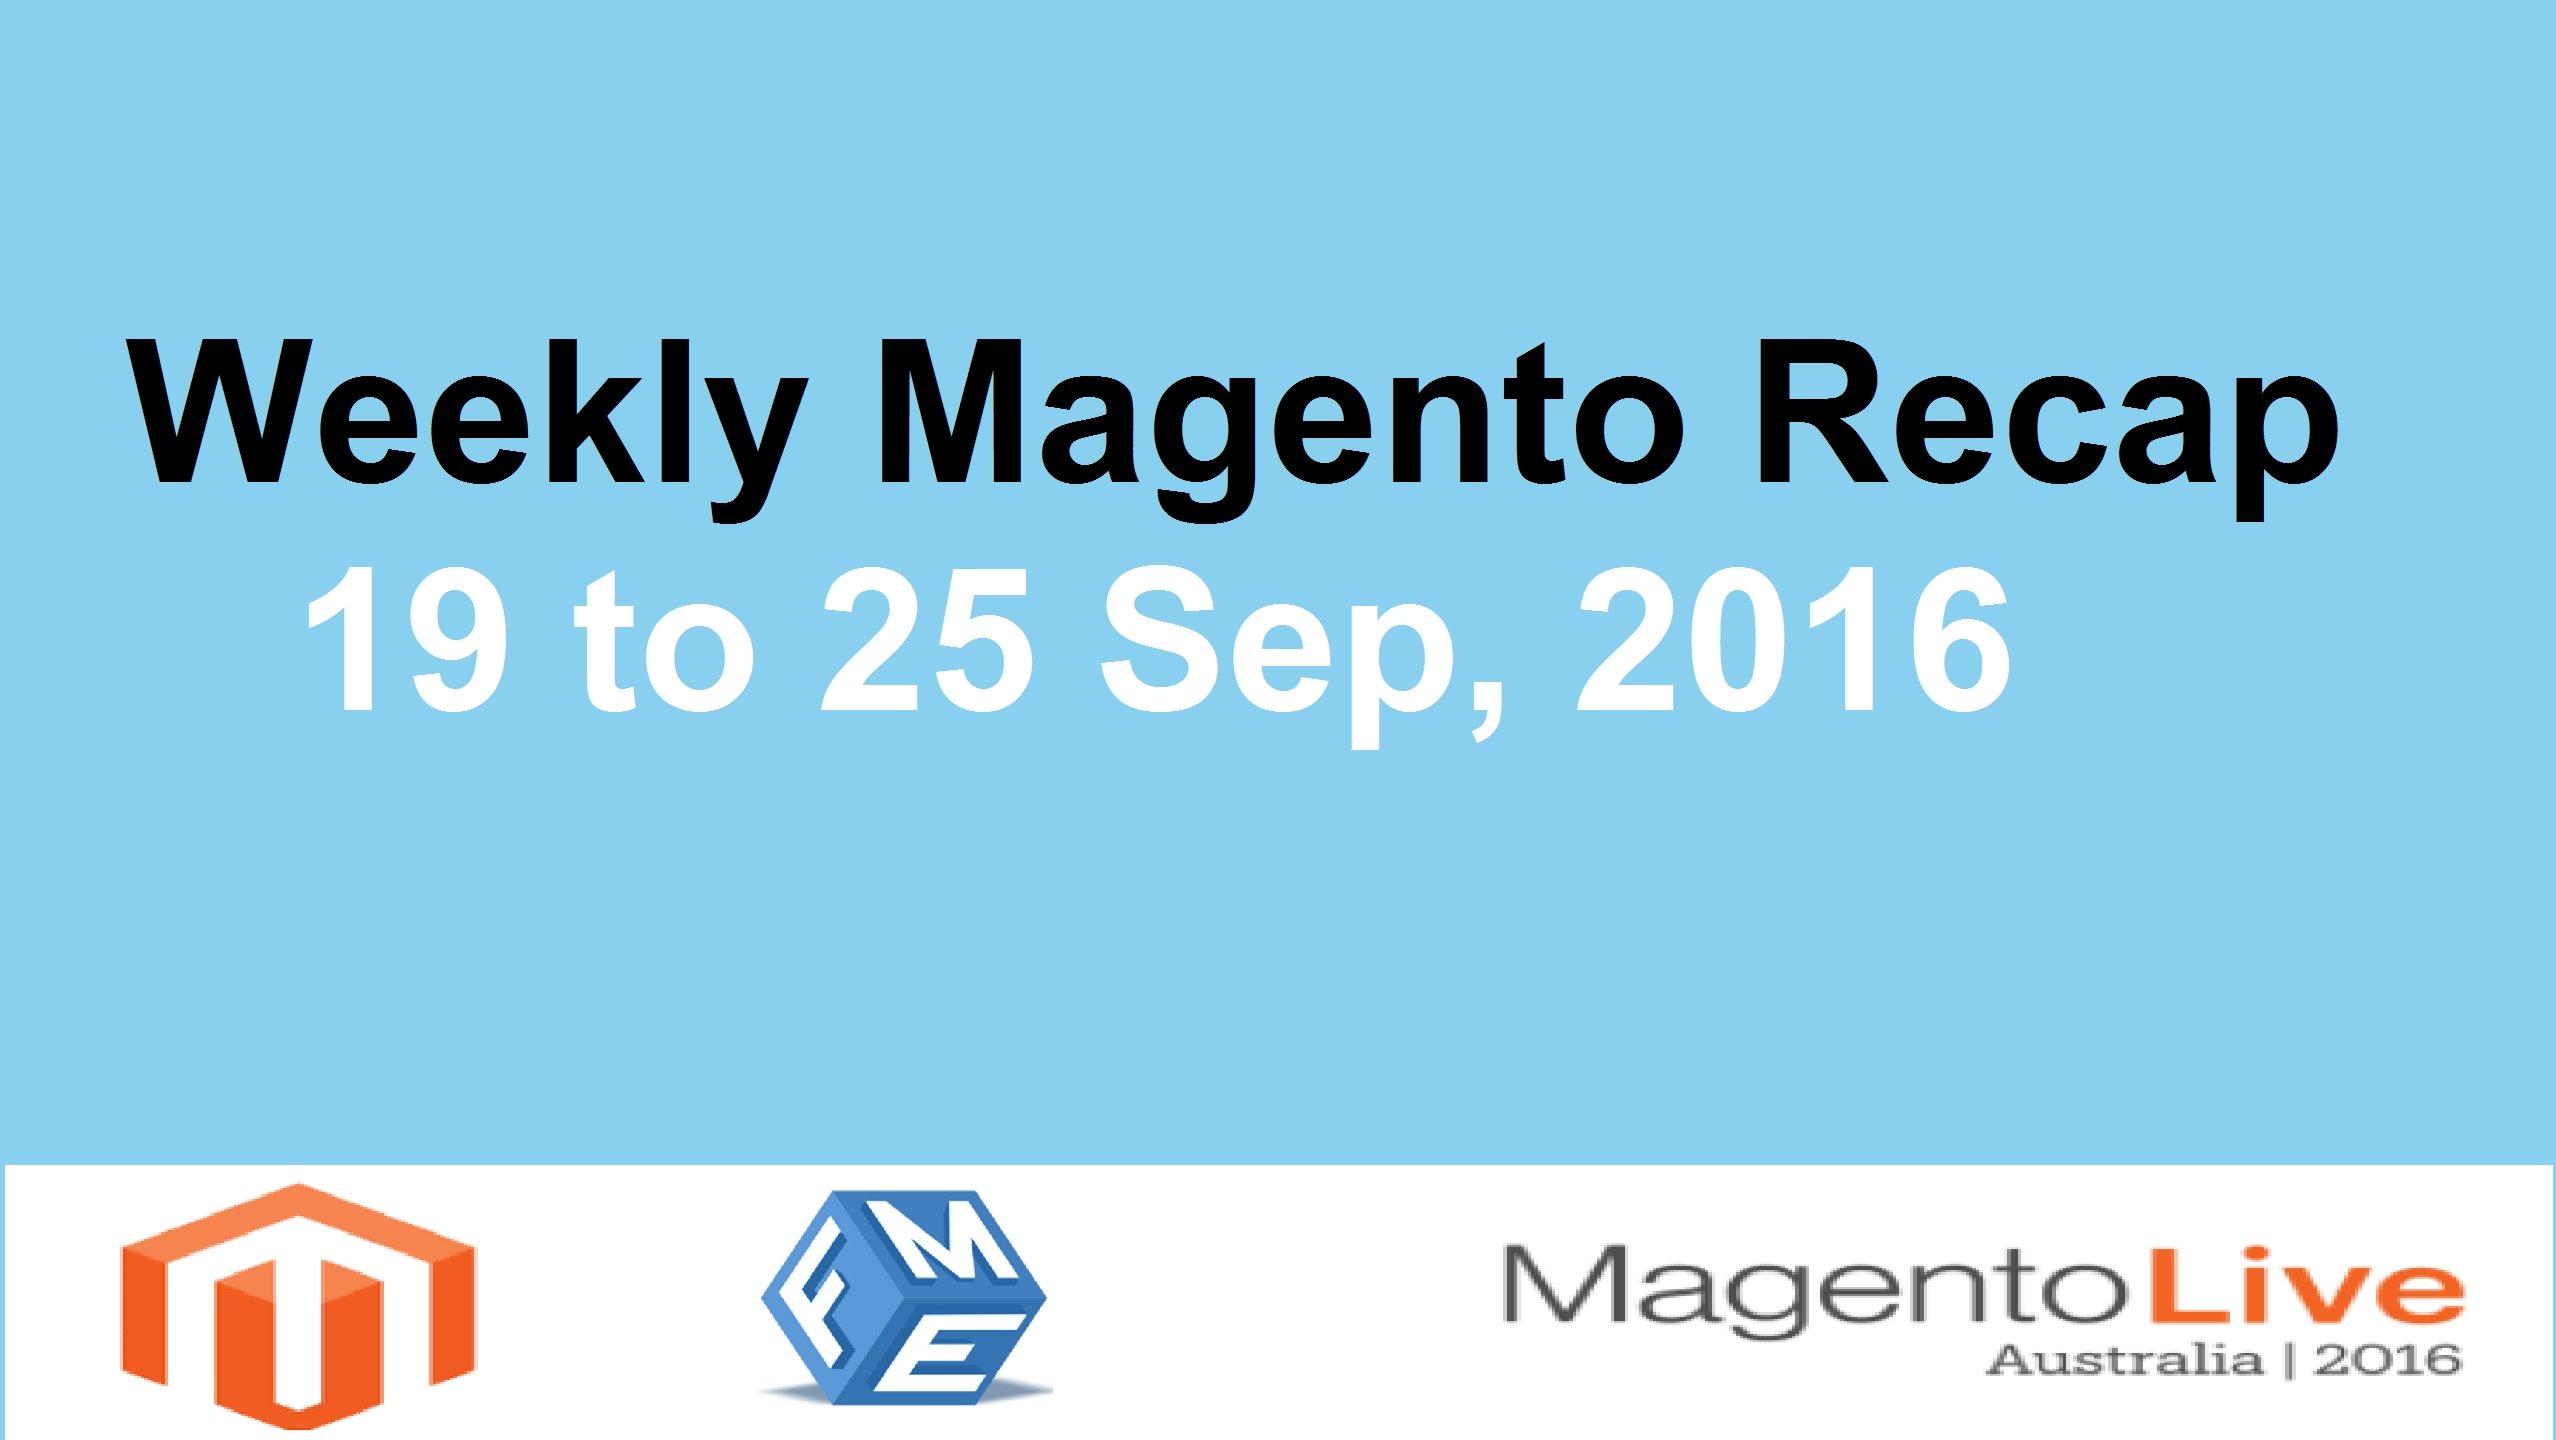 Weekly Magento Recap – What Was Hot Last Week?